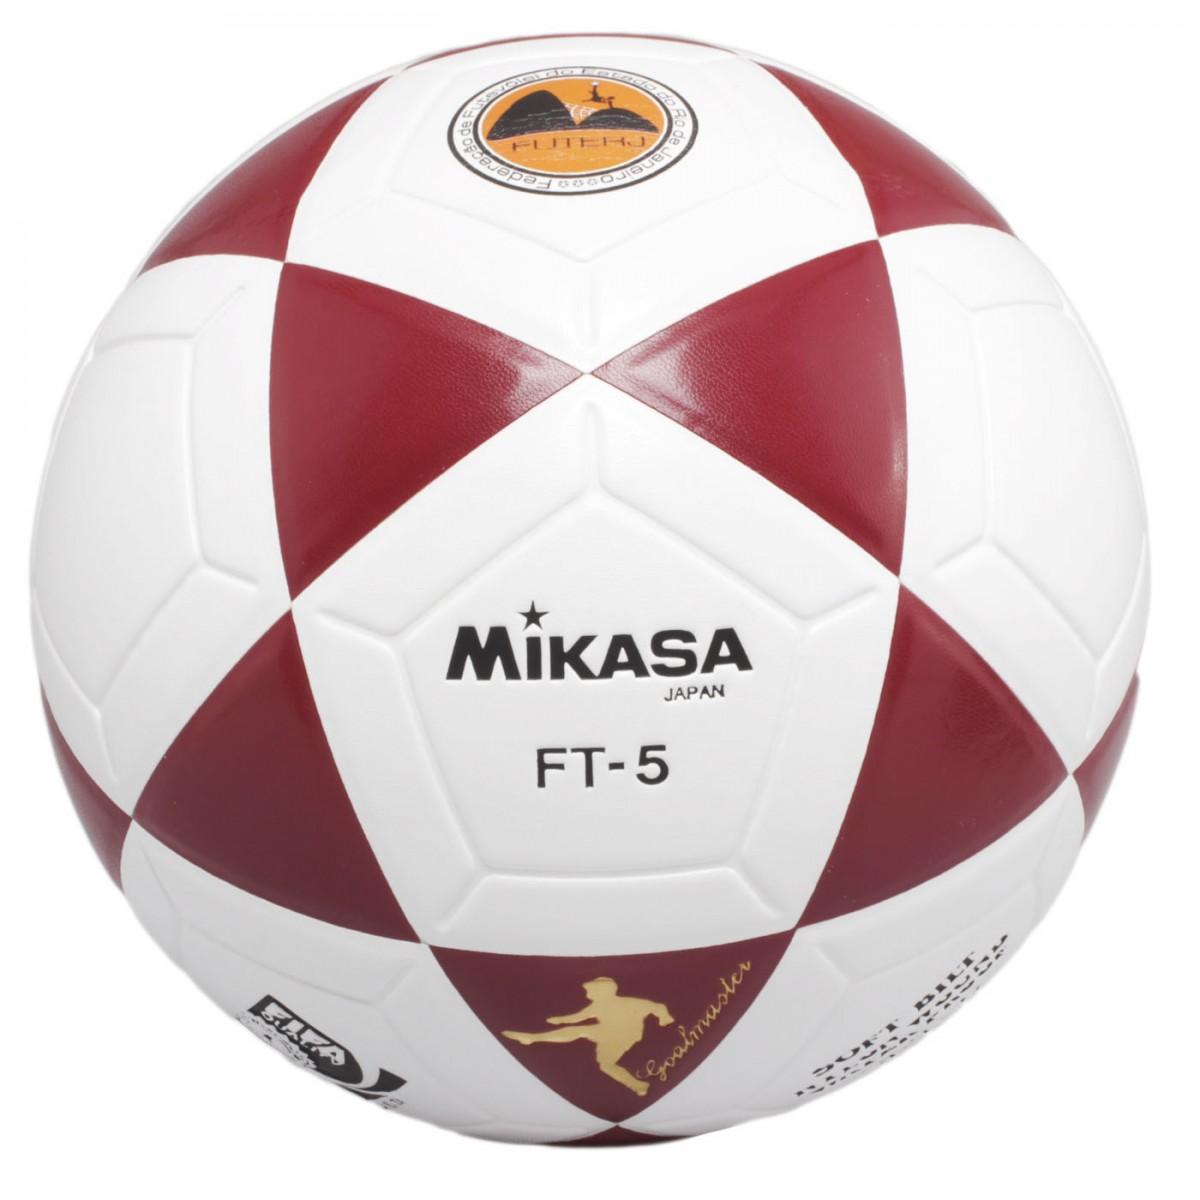 d918abcaf9 Bola Mikasa Futevôlei FT-5